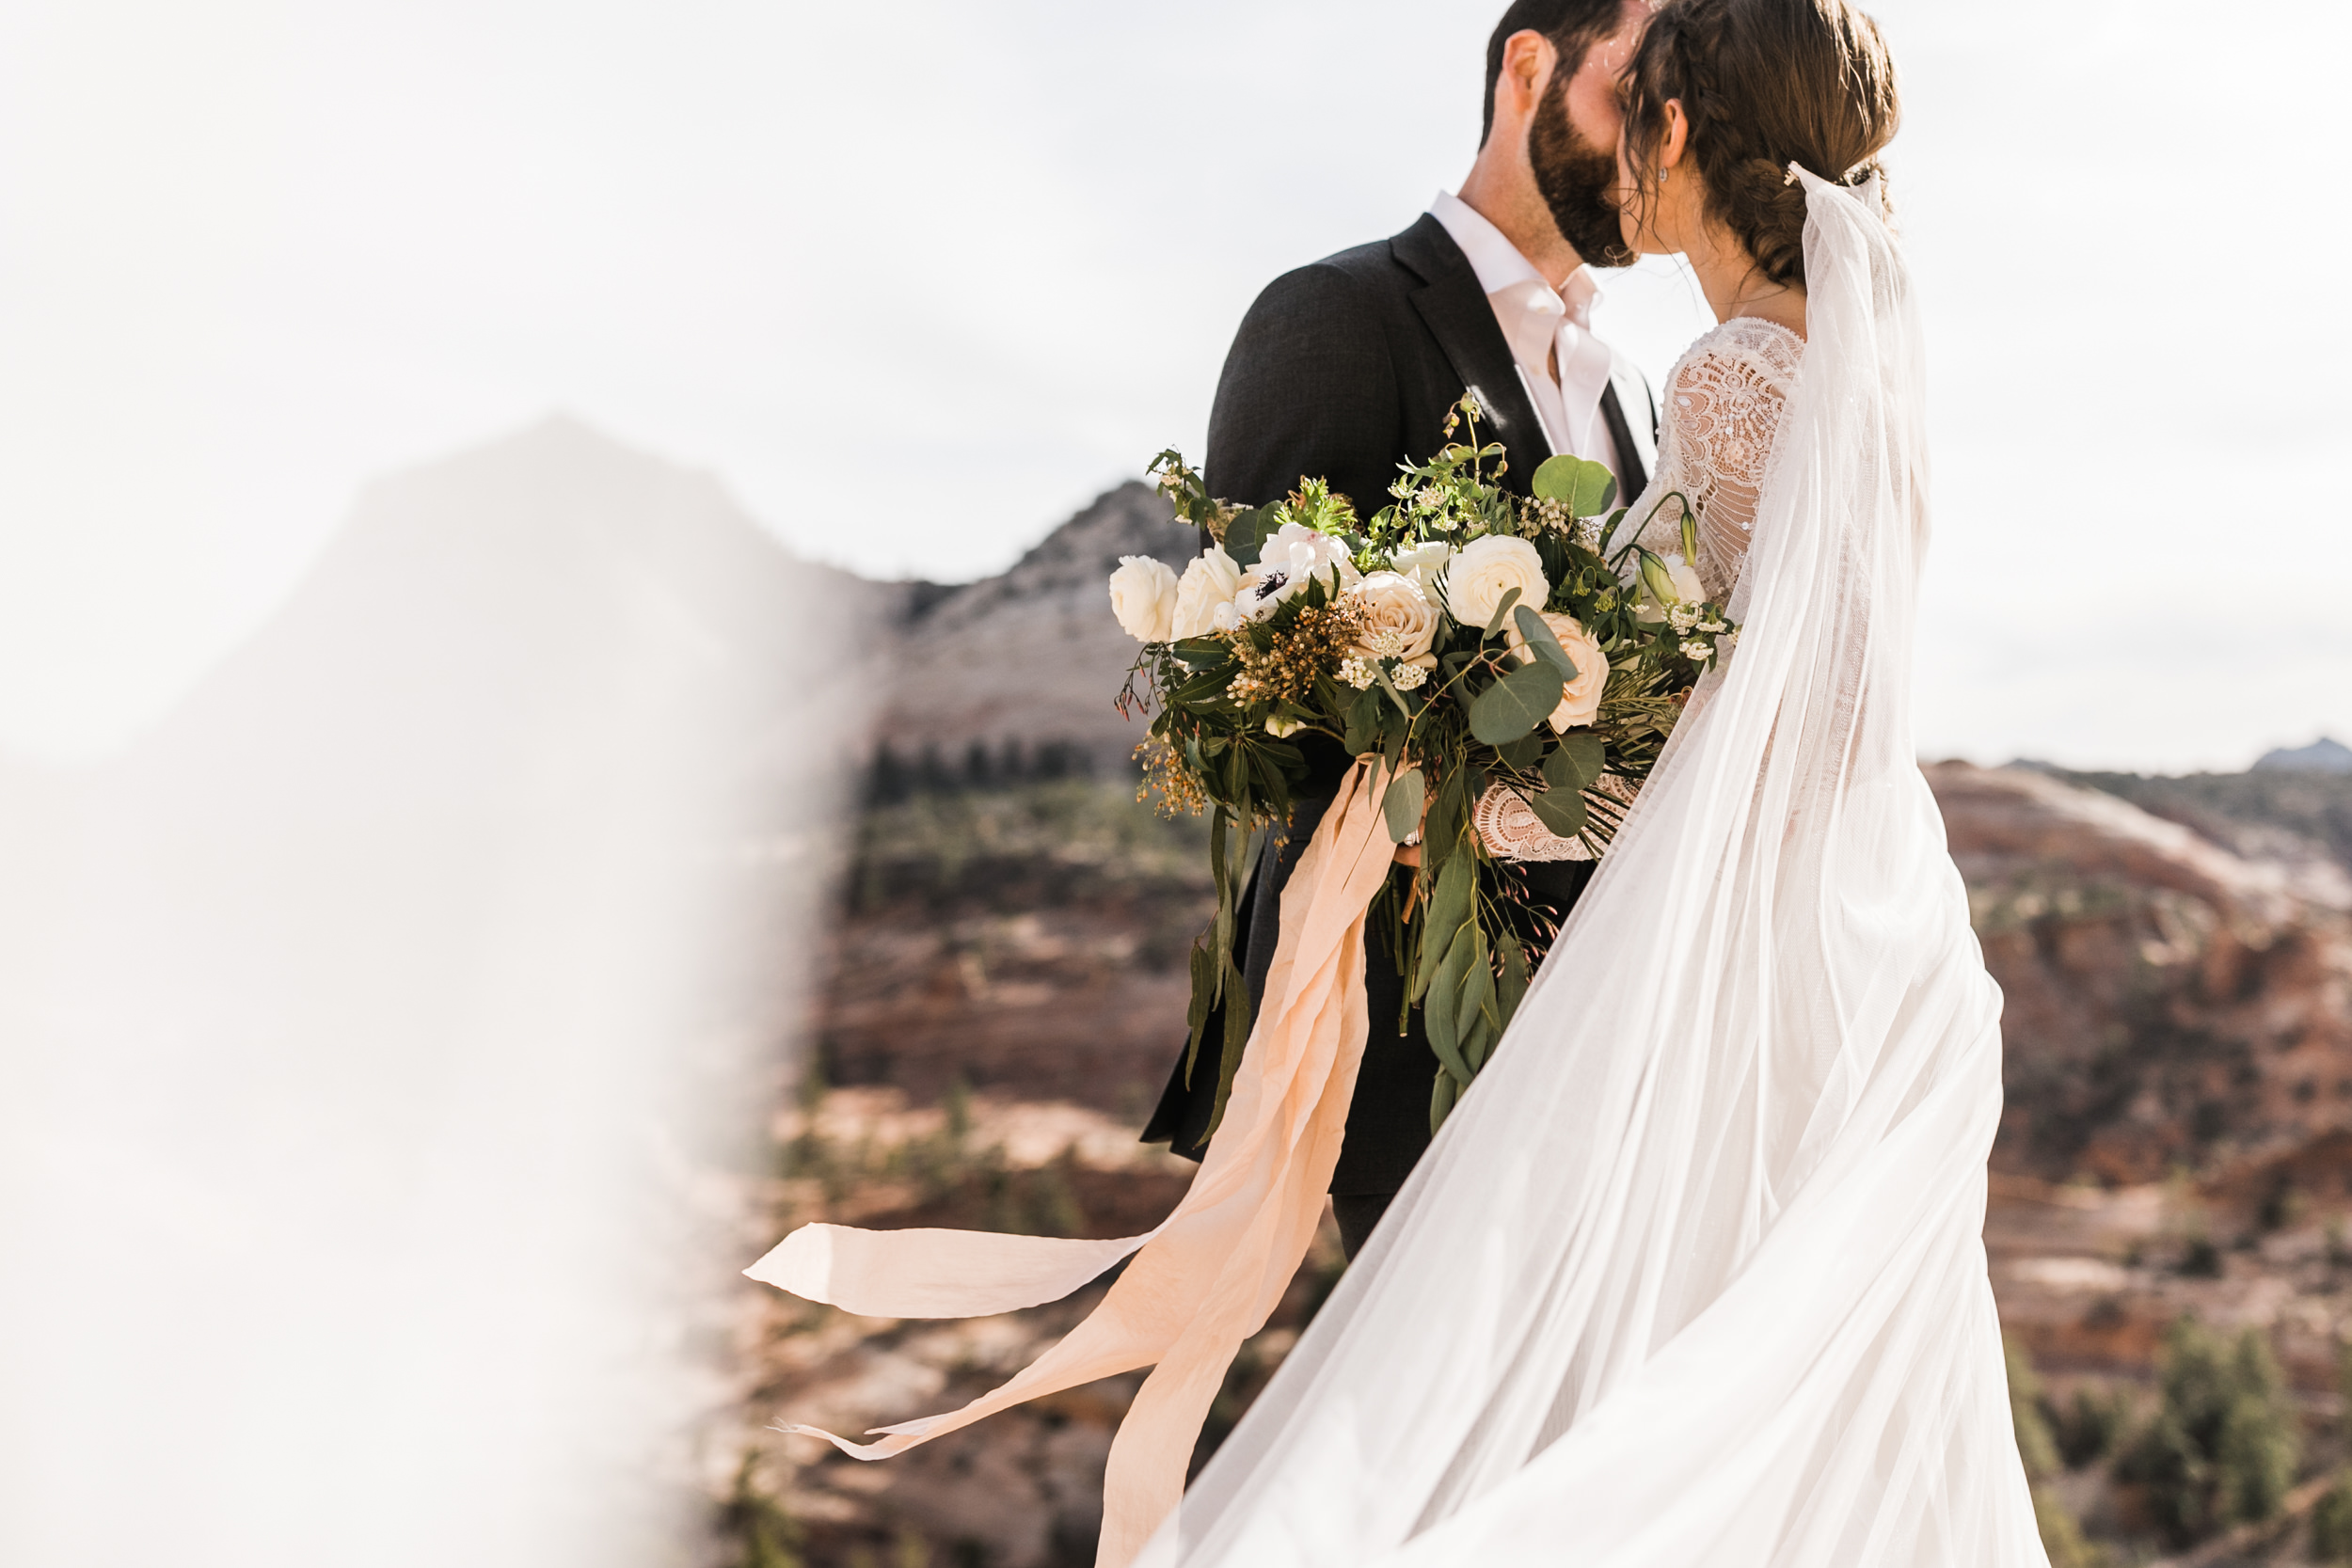 Zion-National-Park-Adventure-Wedding-Hearnes-Elopement-Photography-1.jpg